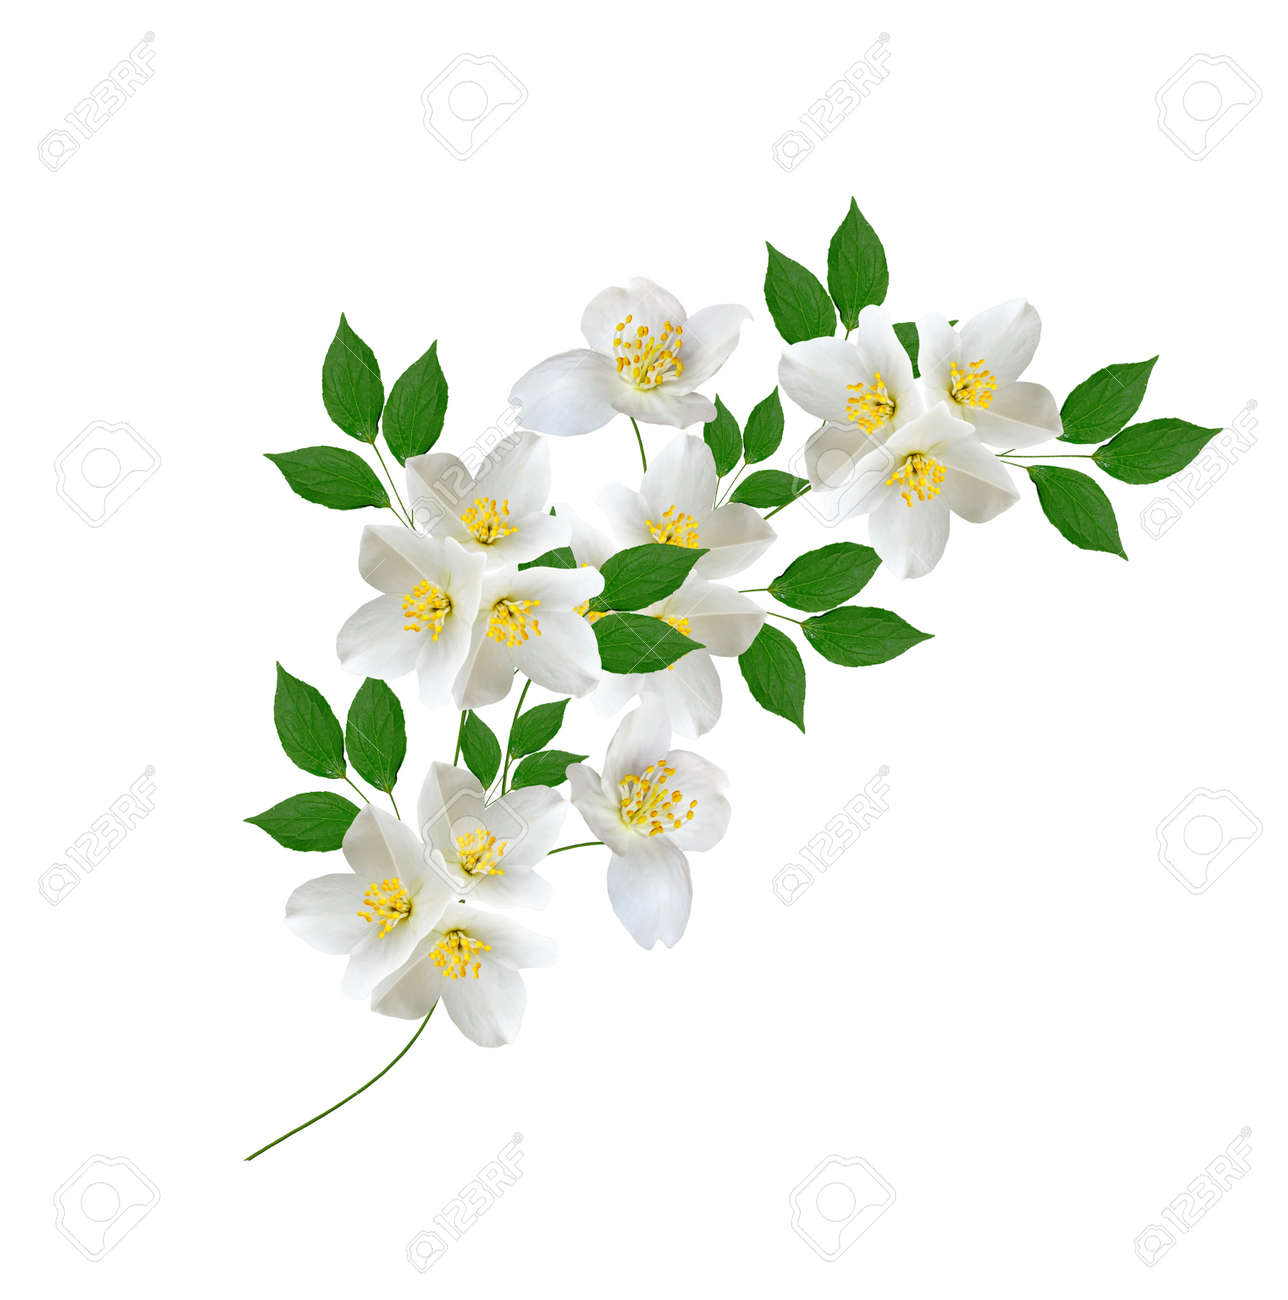 White Jasmine Flower Branch Of Jasmine Flowers Isolated On Stock